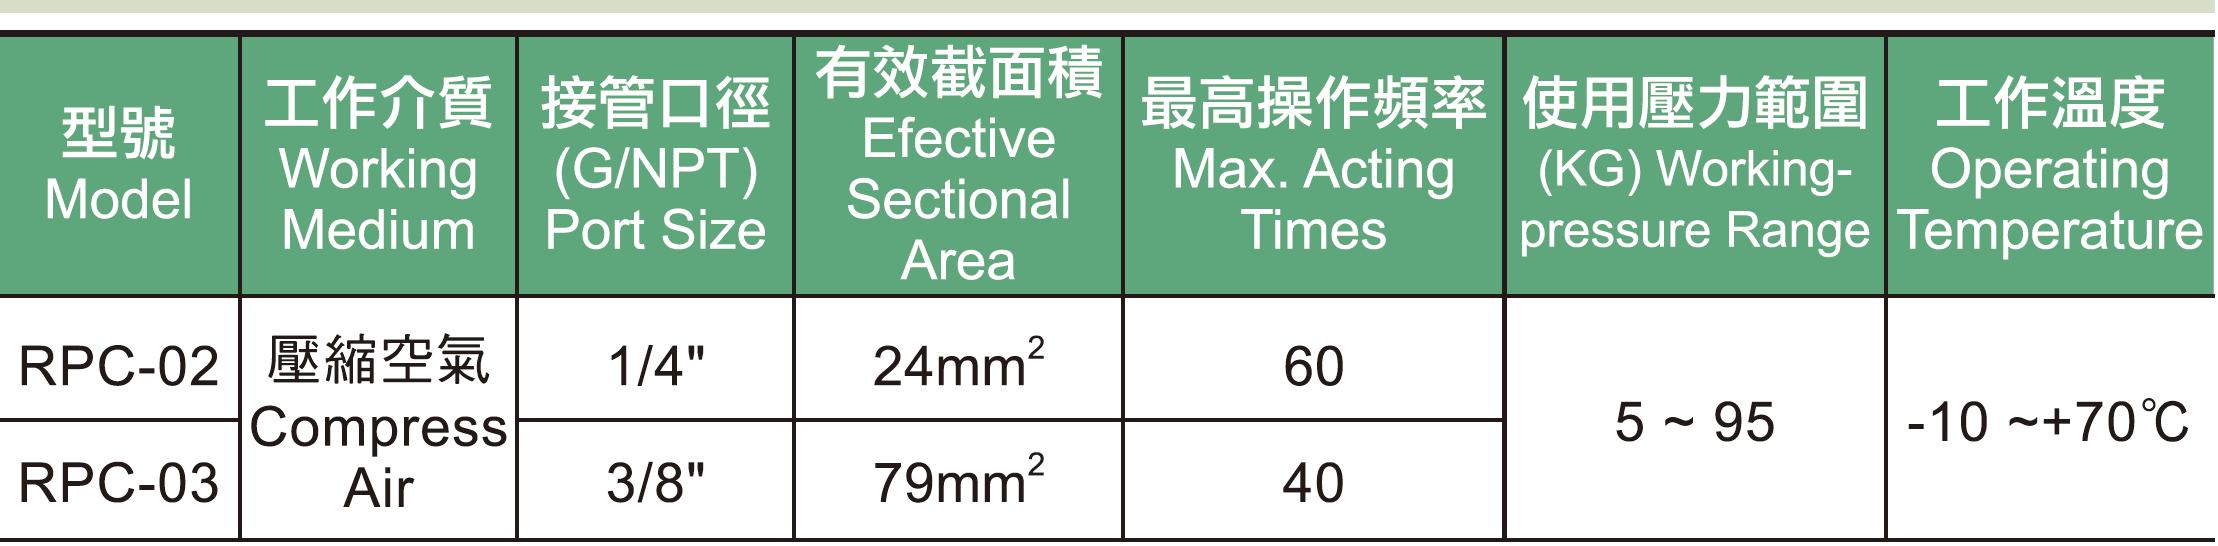 RPC系列引導式逆止閥規格表.jpg